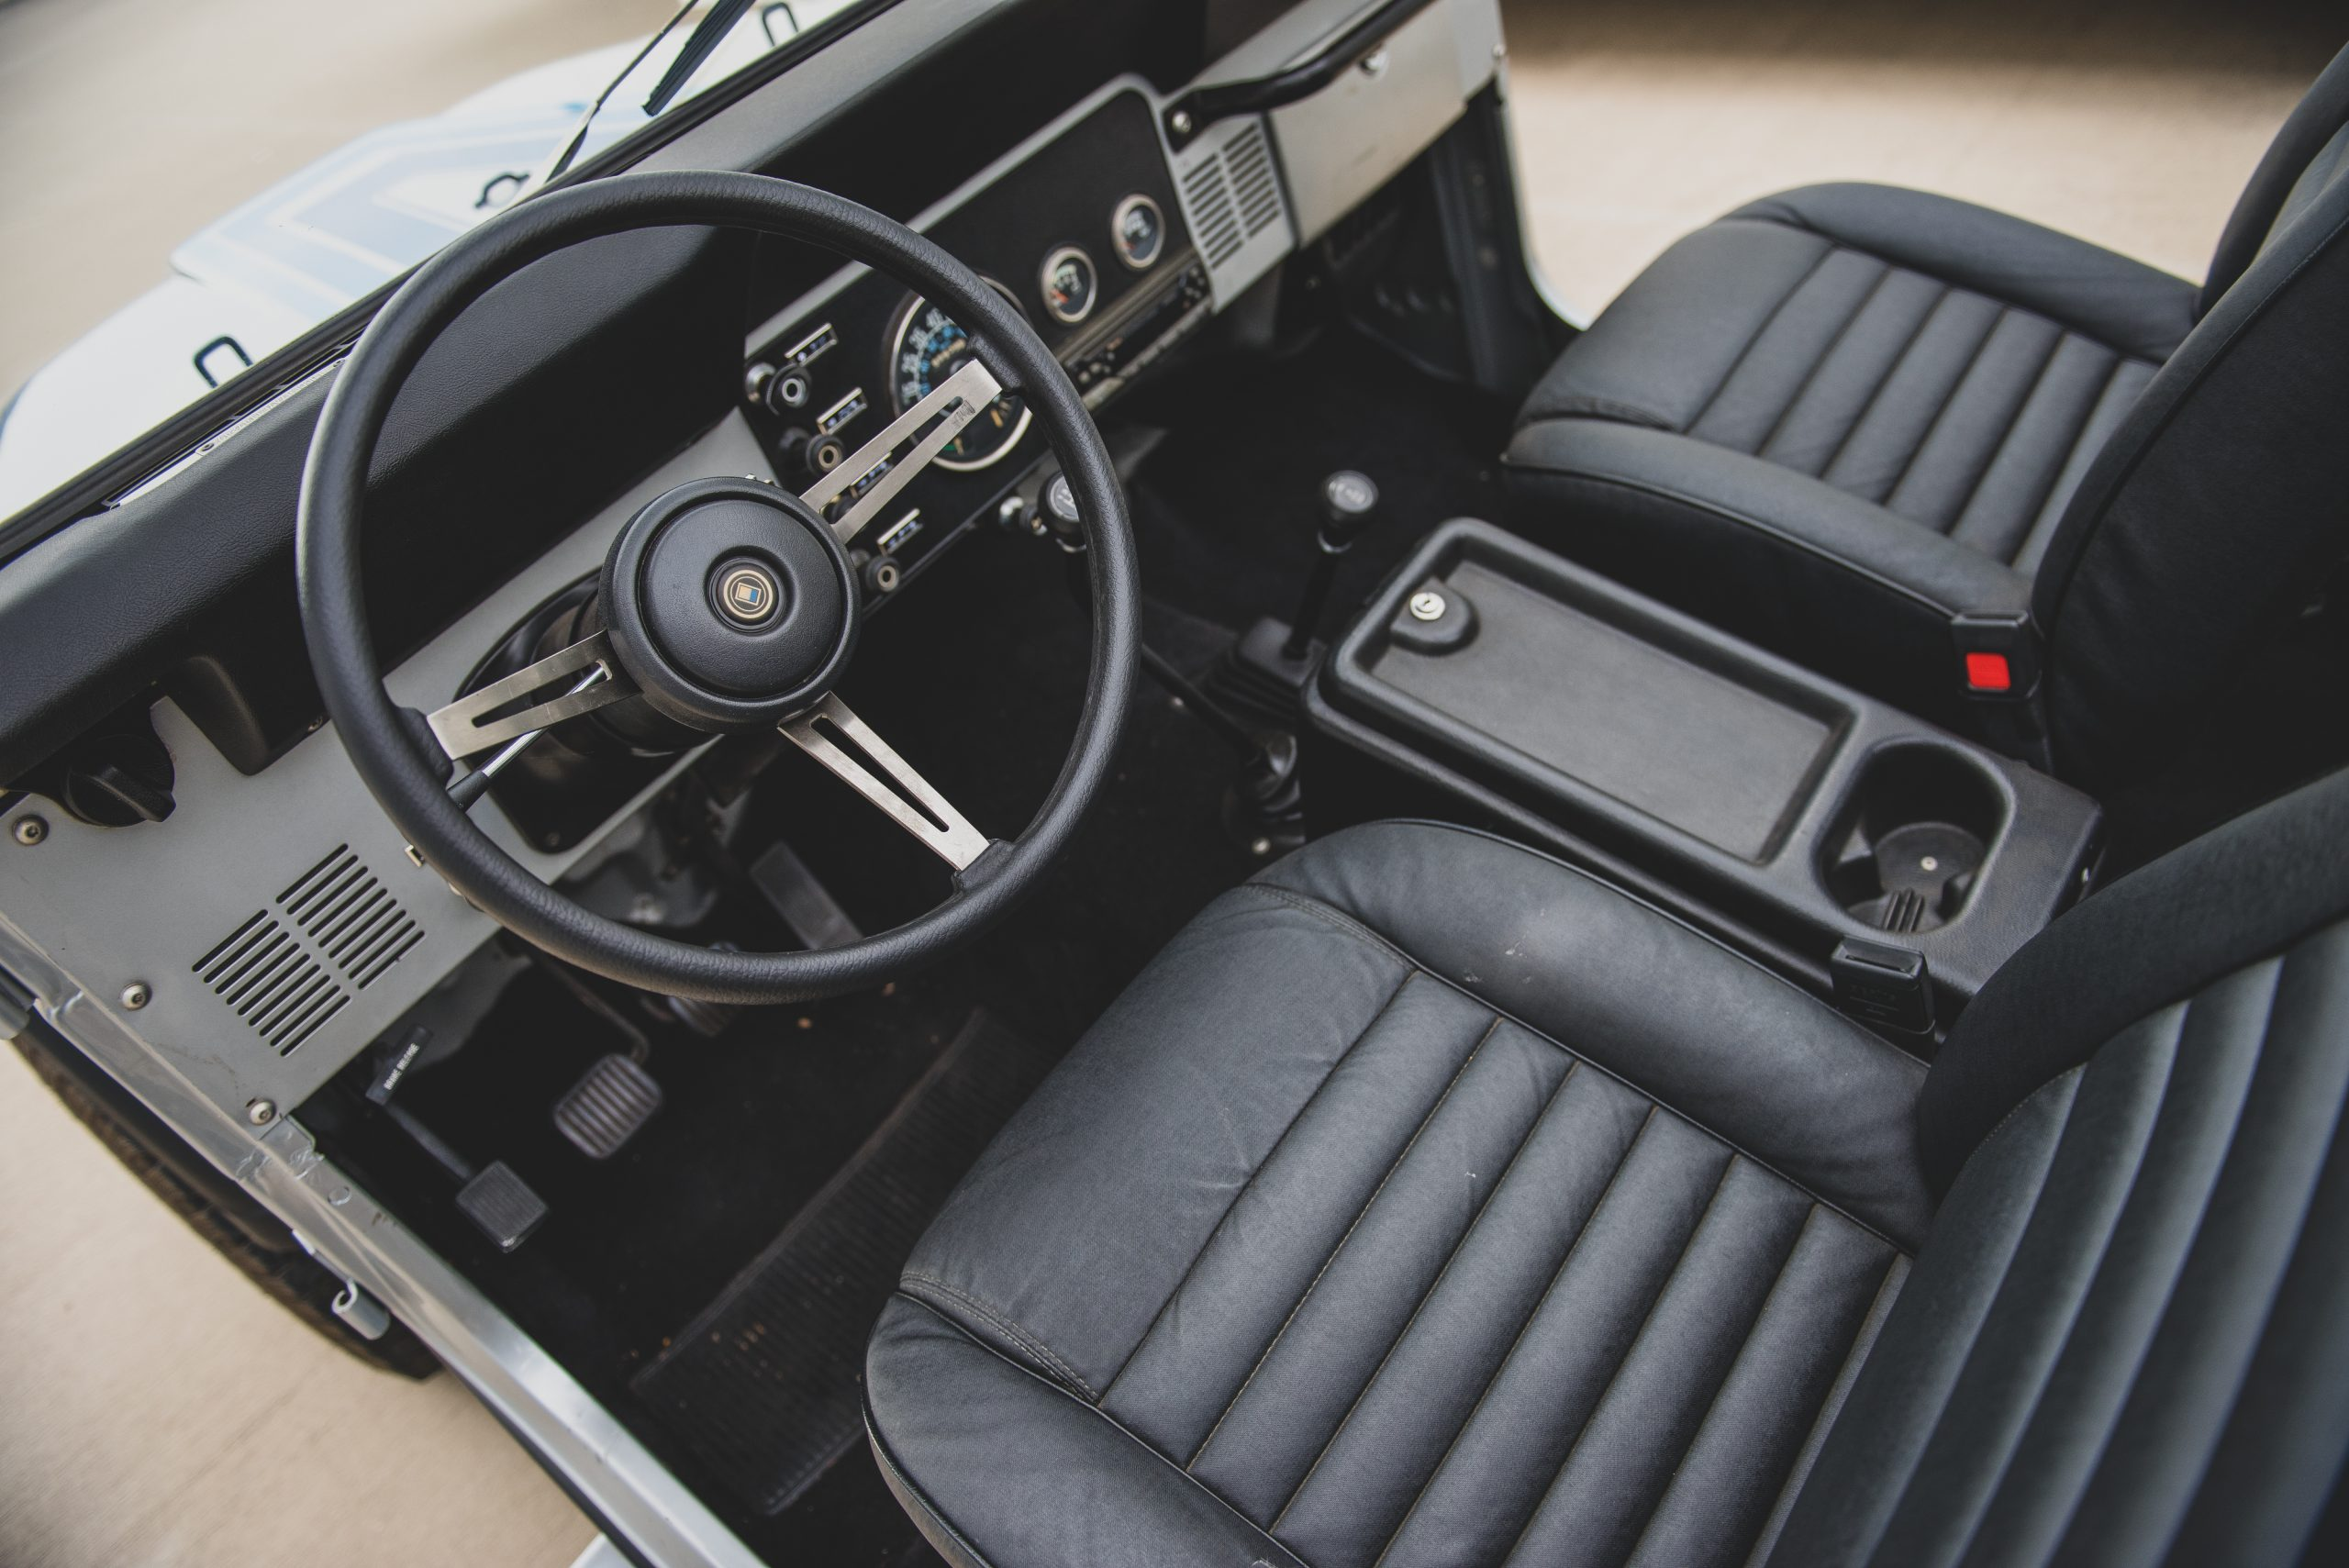 Jeep CJ7 Renegade interior